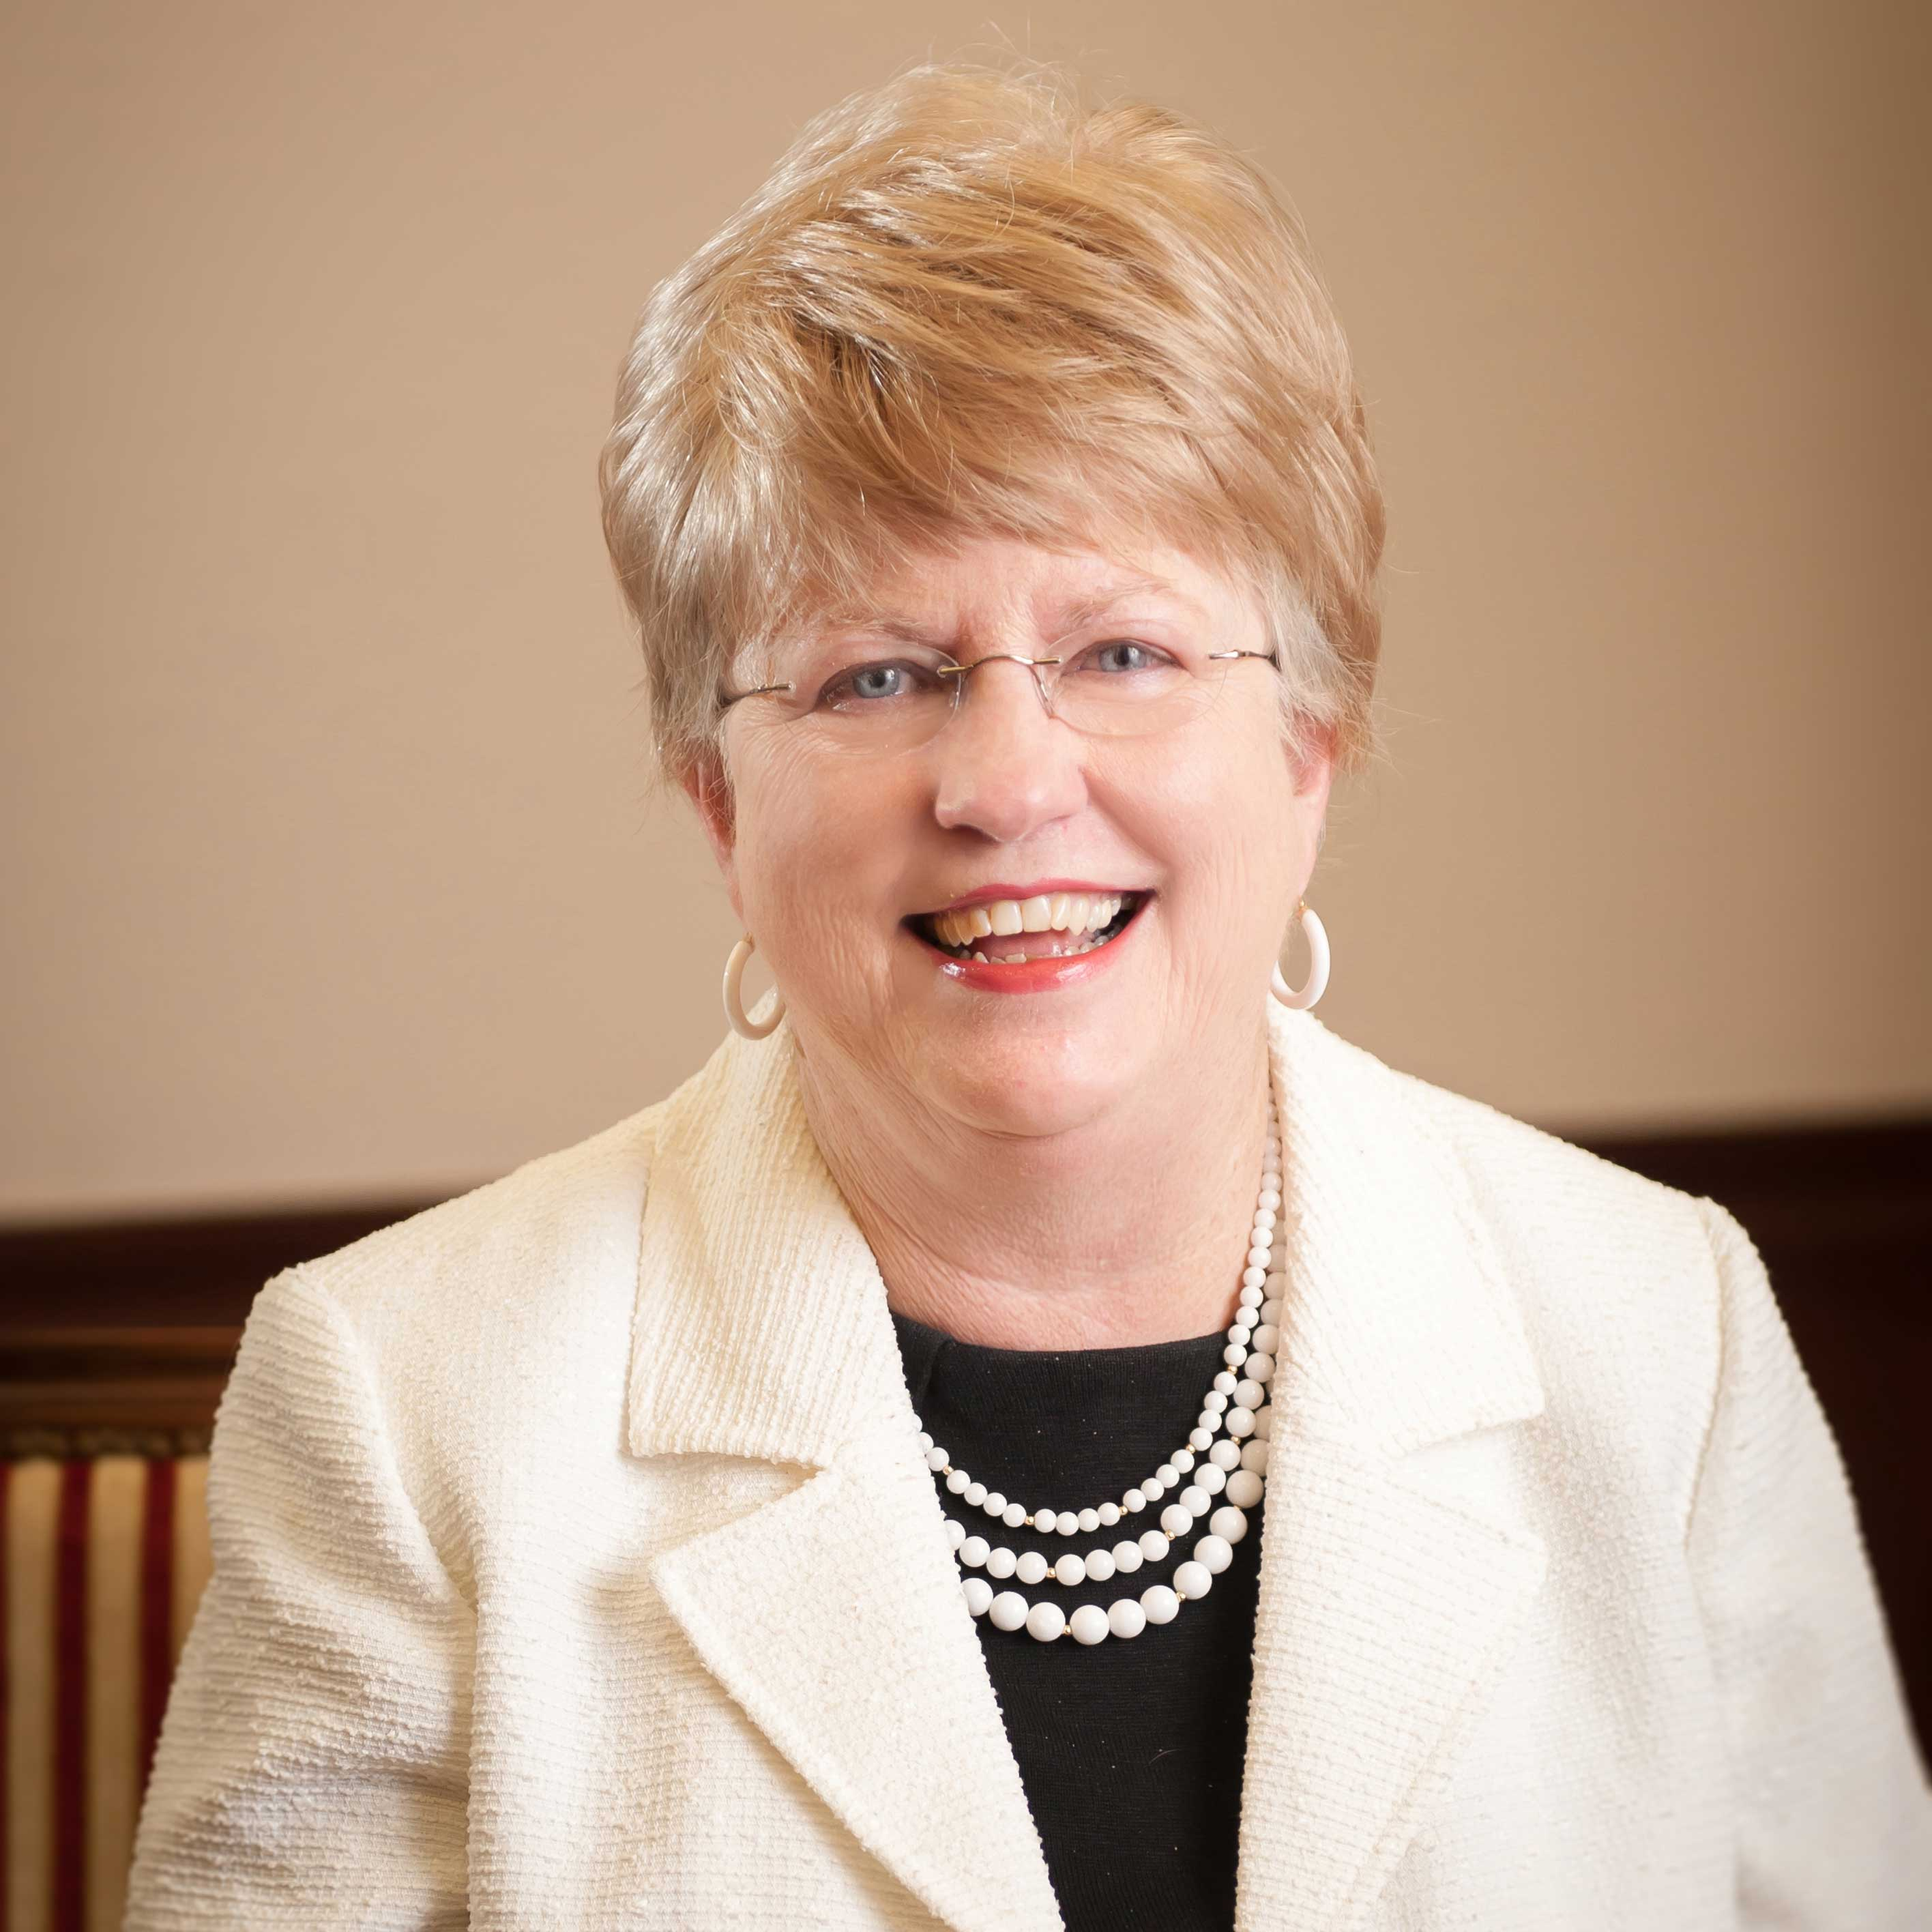 Judith Bonner